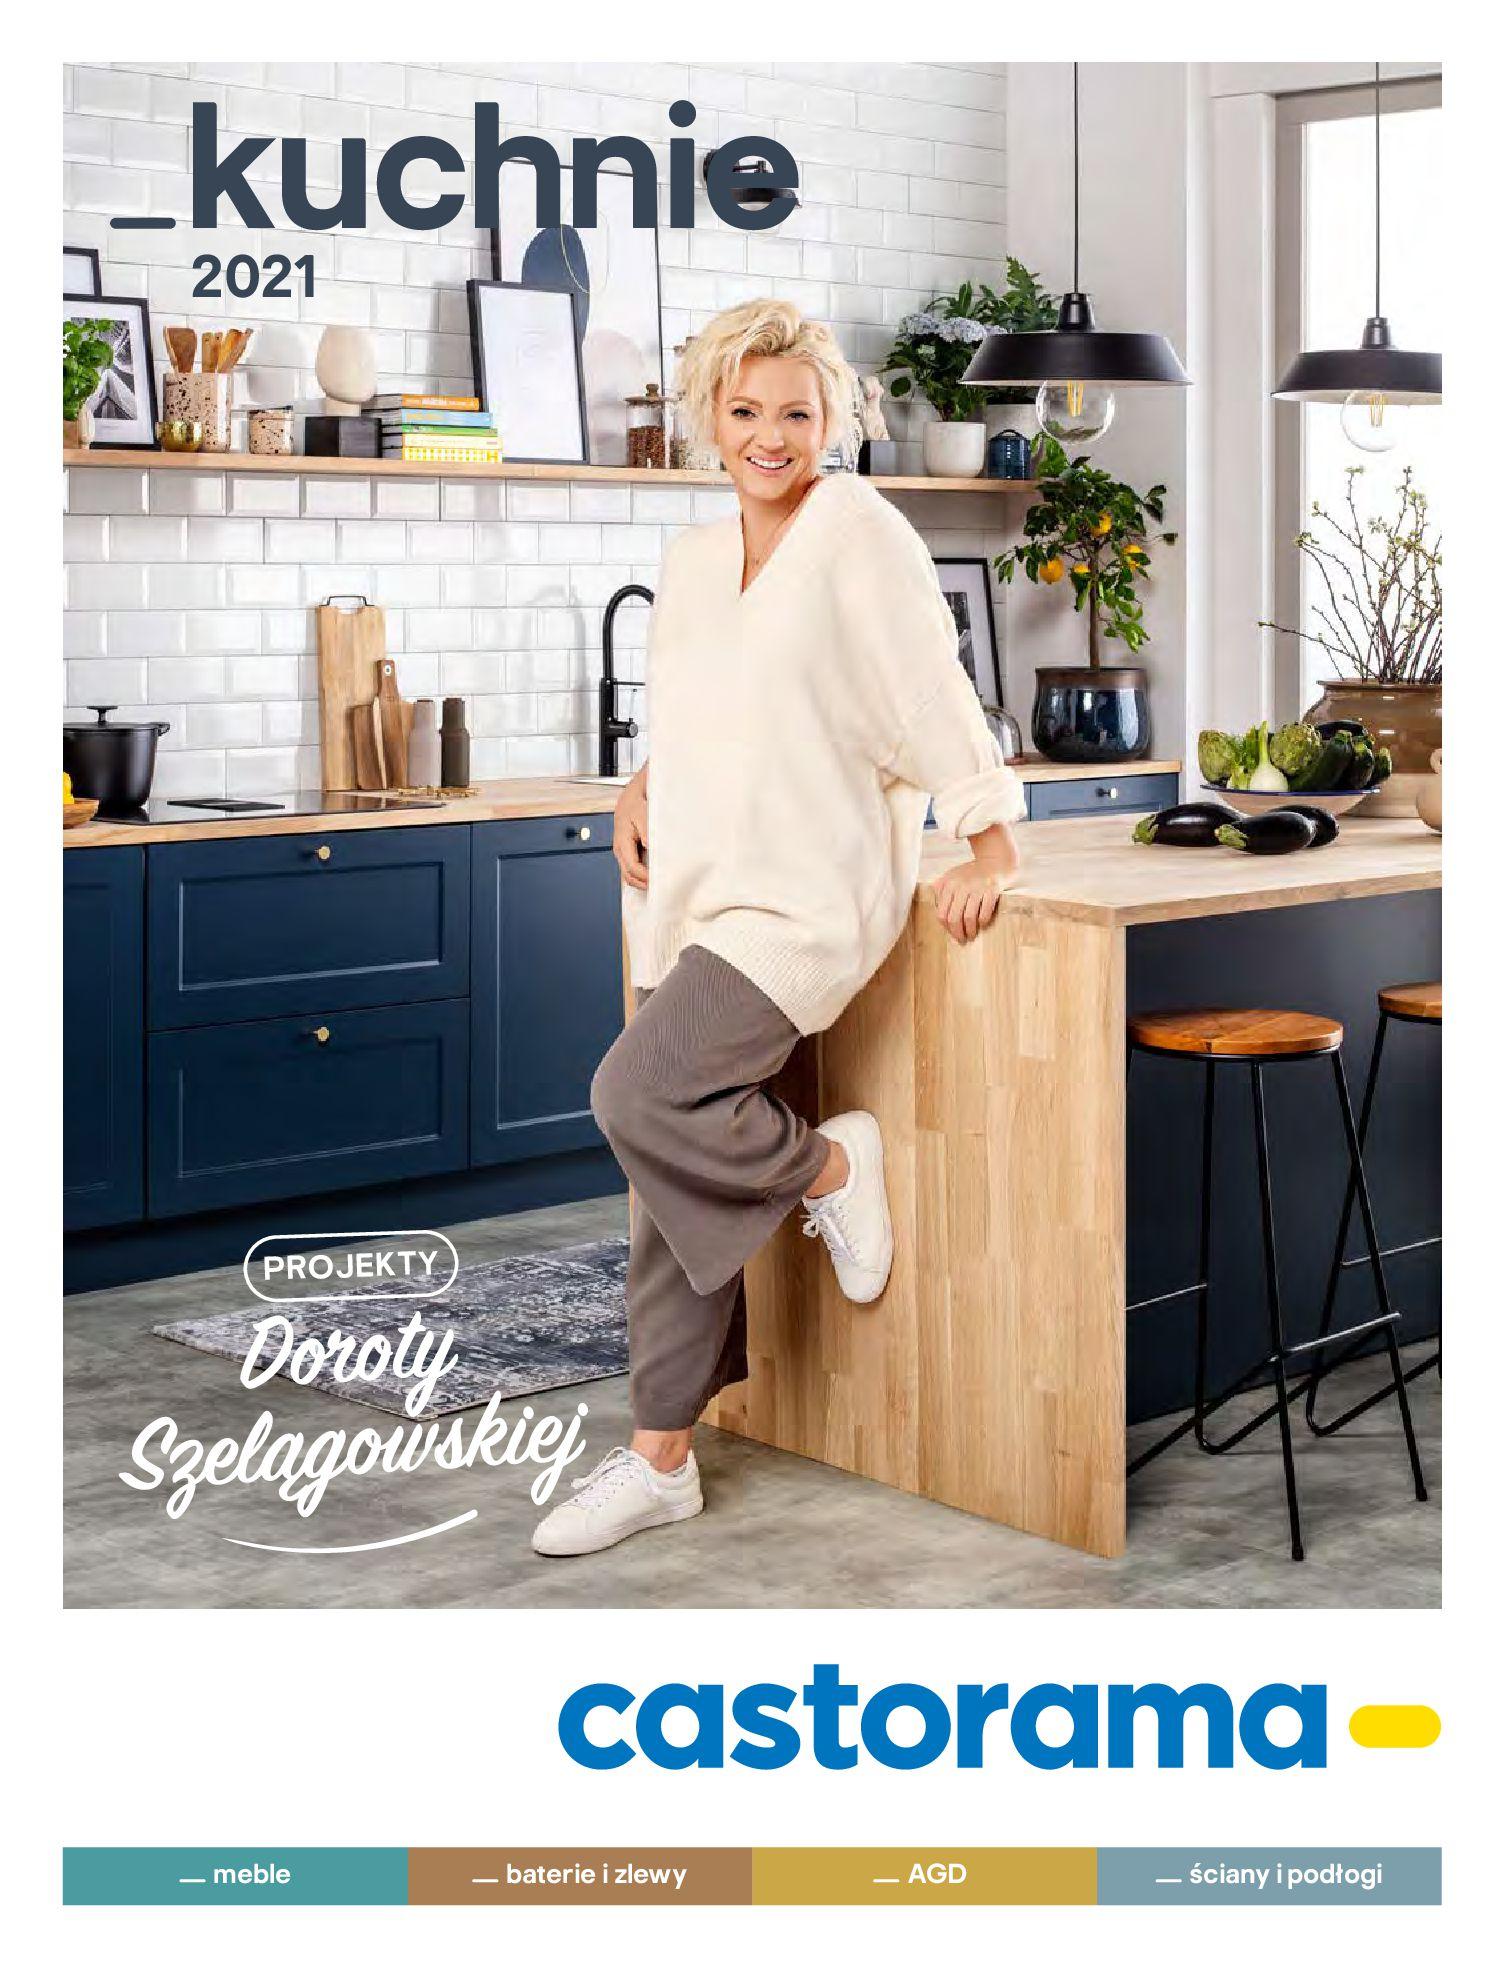 Castorama:  Katalog kuchnie 2021 03.05.2021